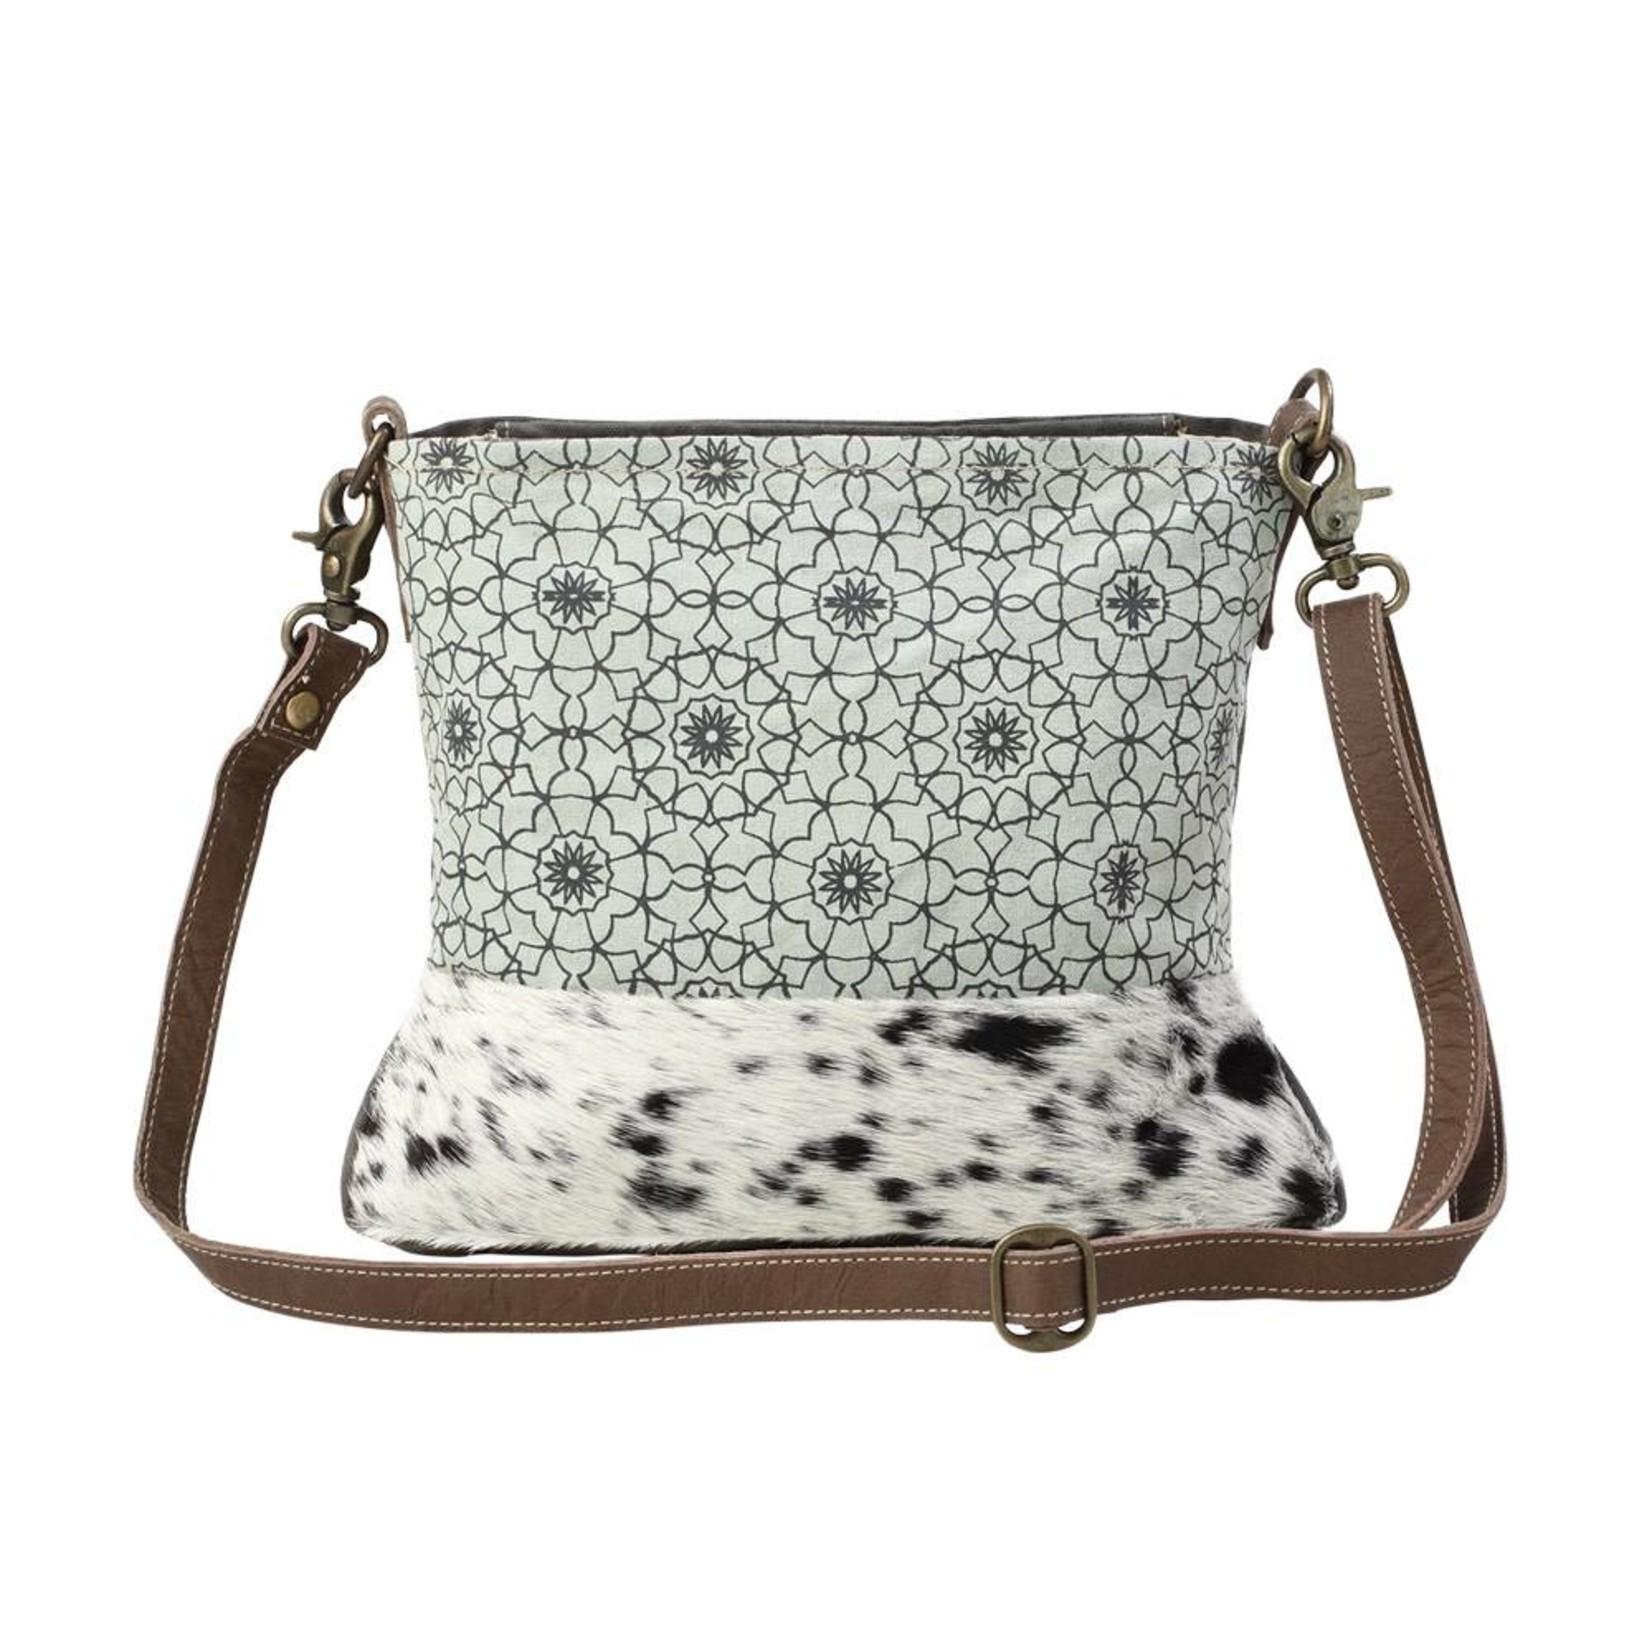 Myra Bags S-1196 Green Floral Print Bag